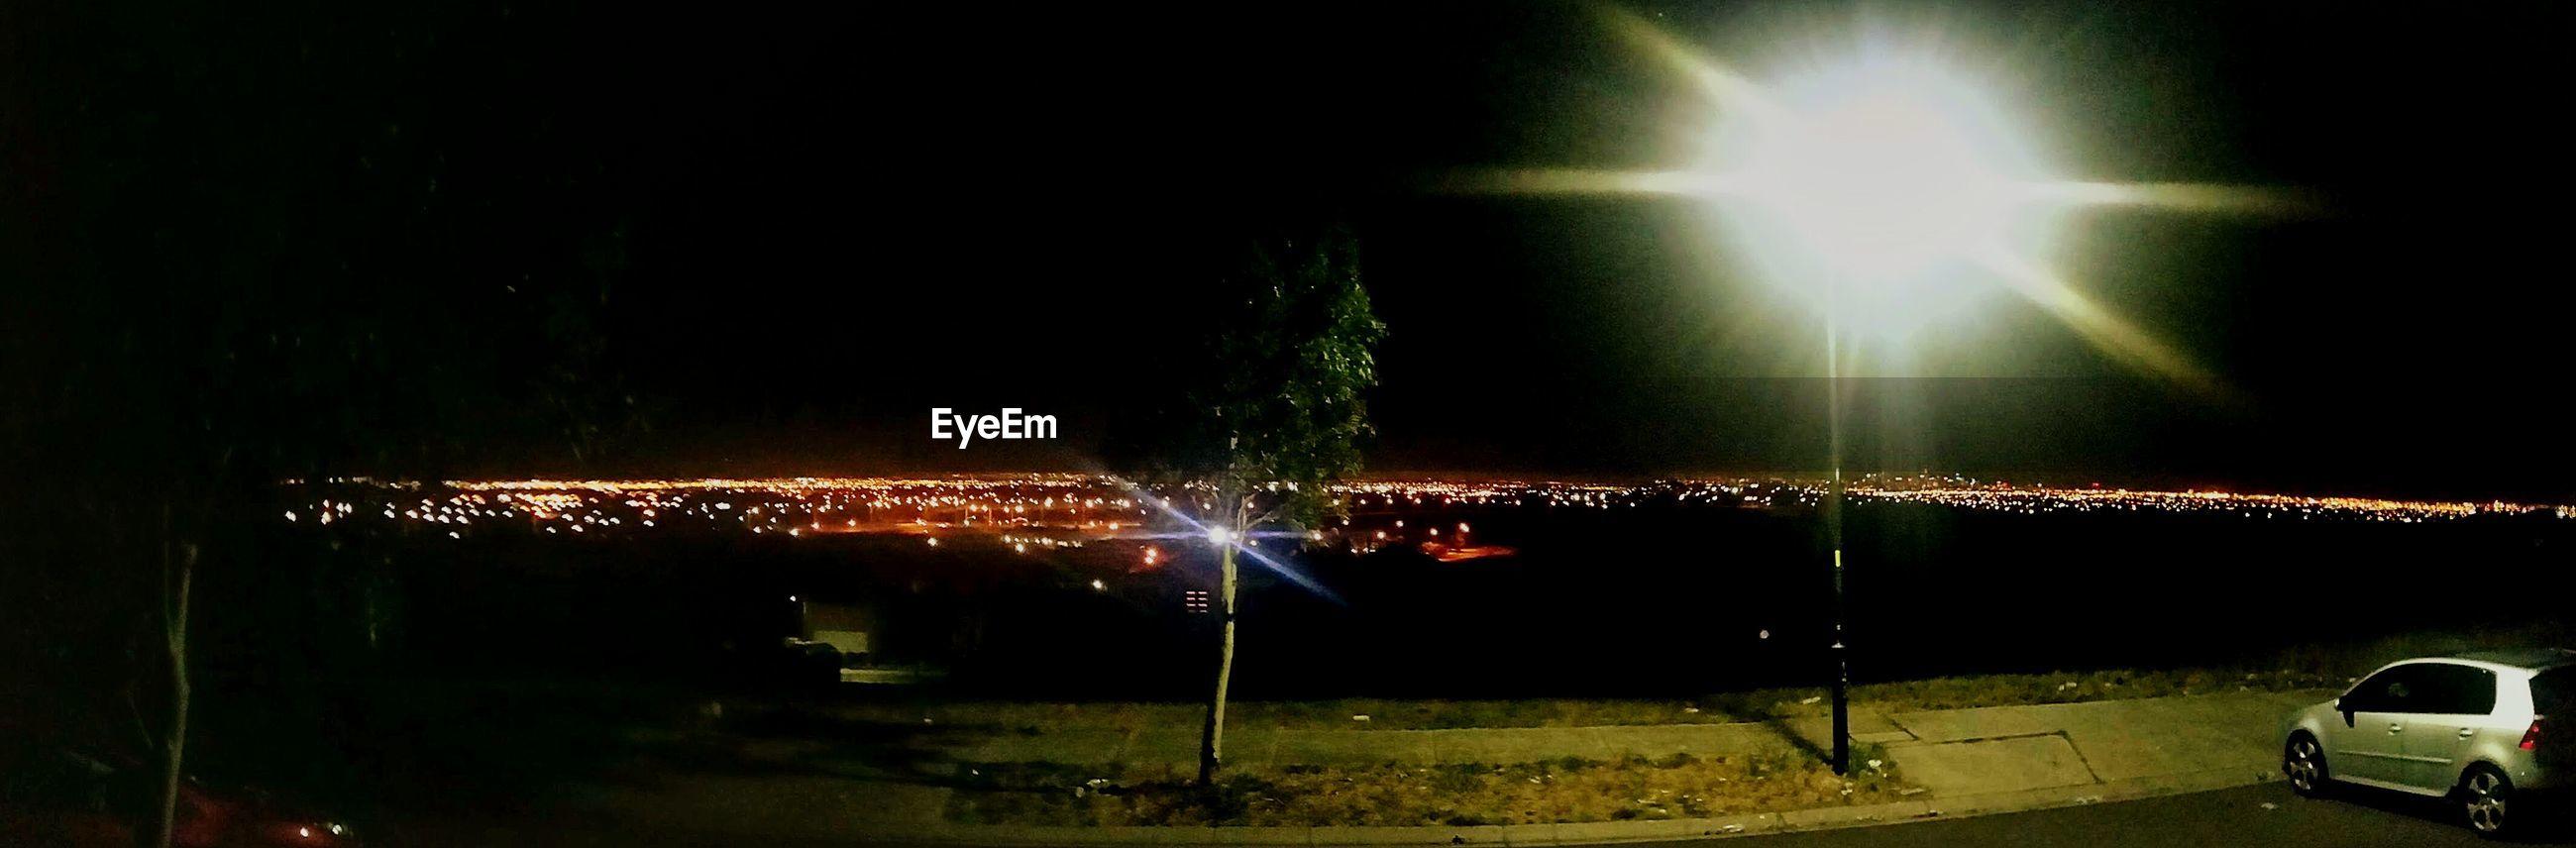 night, illuminated, lighting equipment, no people, outdoors, sky, nature